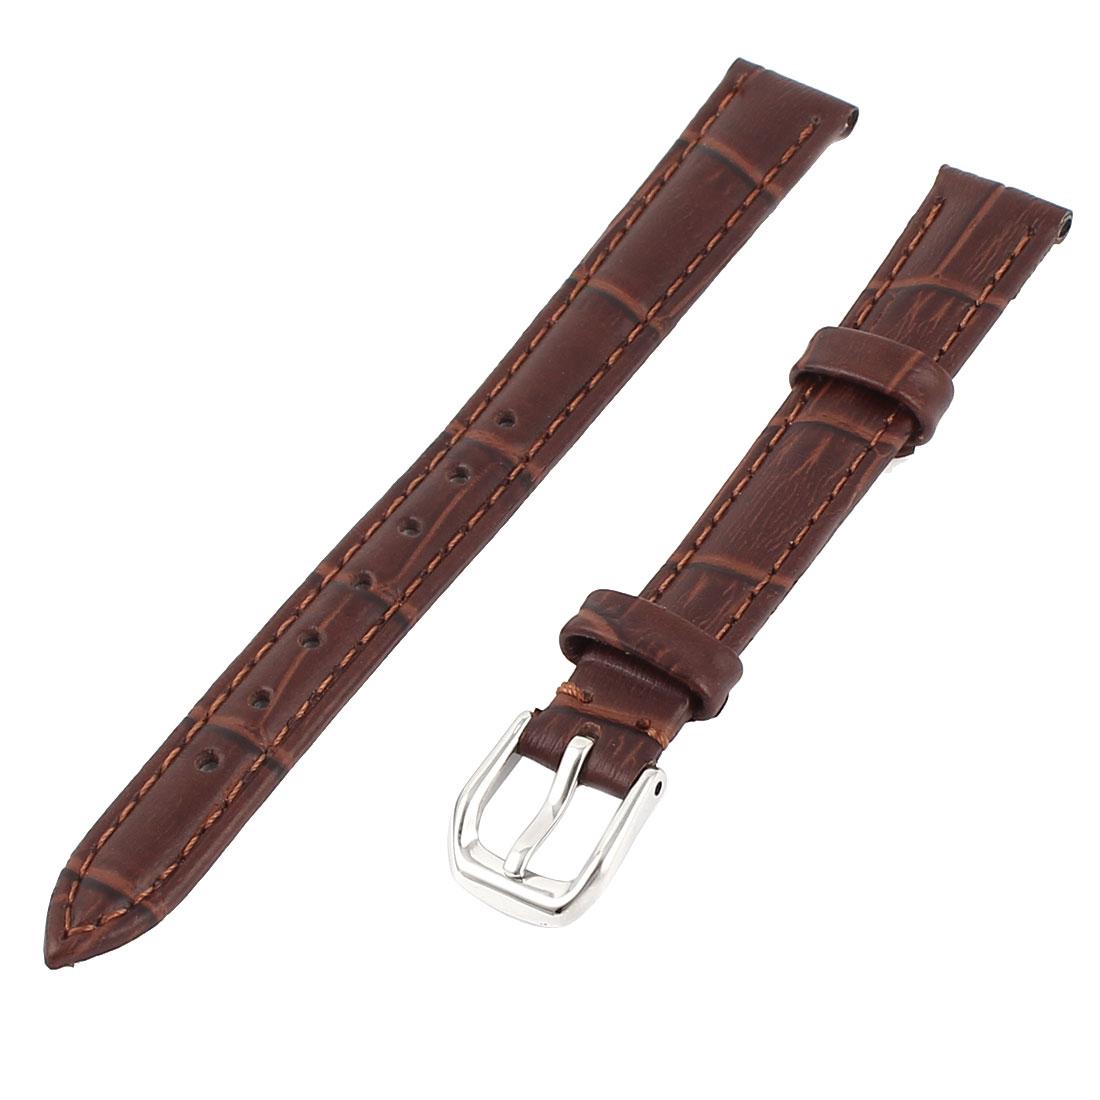 Faux Leather Adjustable Watch Band Belt Bracelet Strap 12mm Width Brown